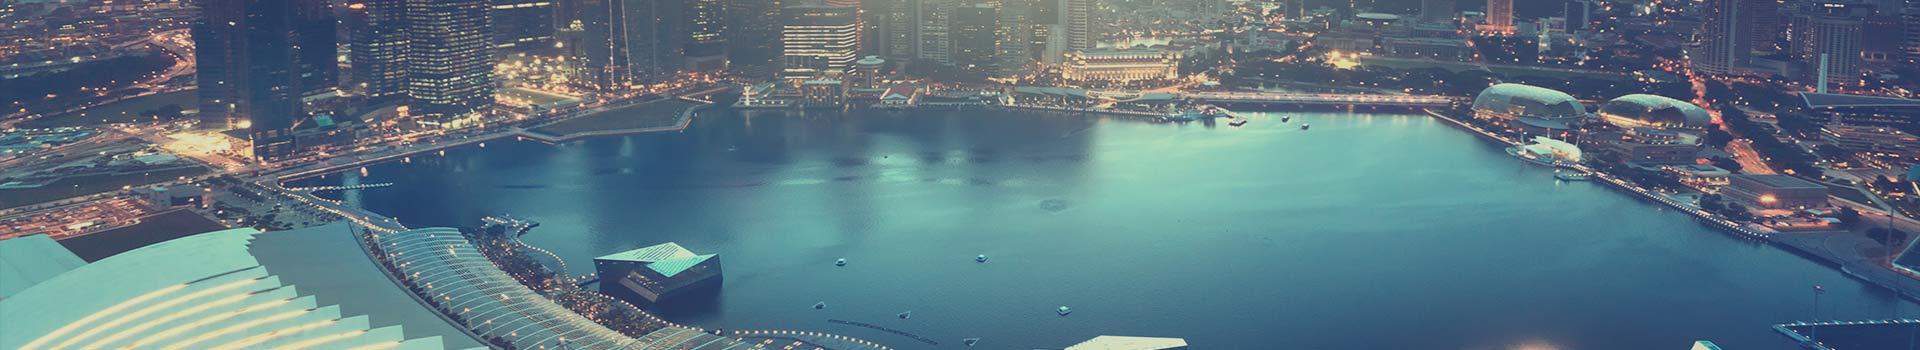 responsive web design company, responsive web development, mobile responsive development company singapore